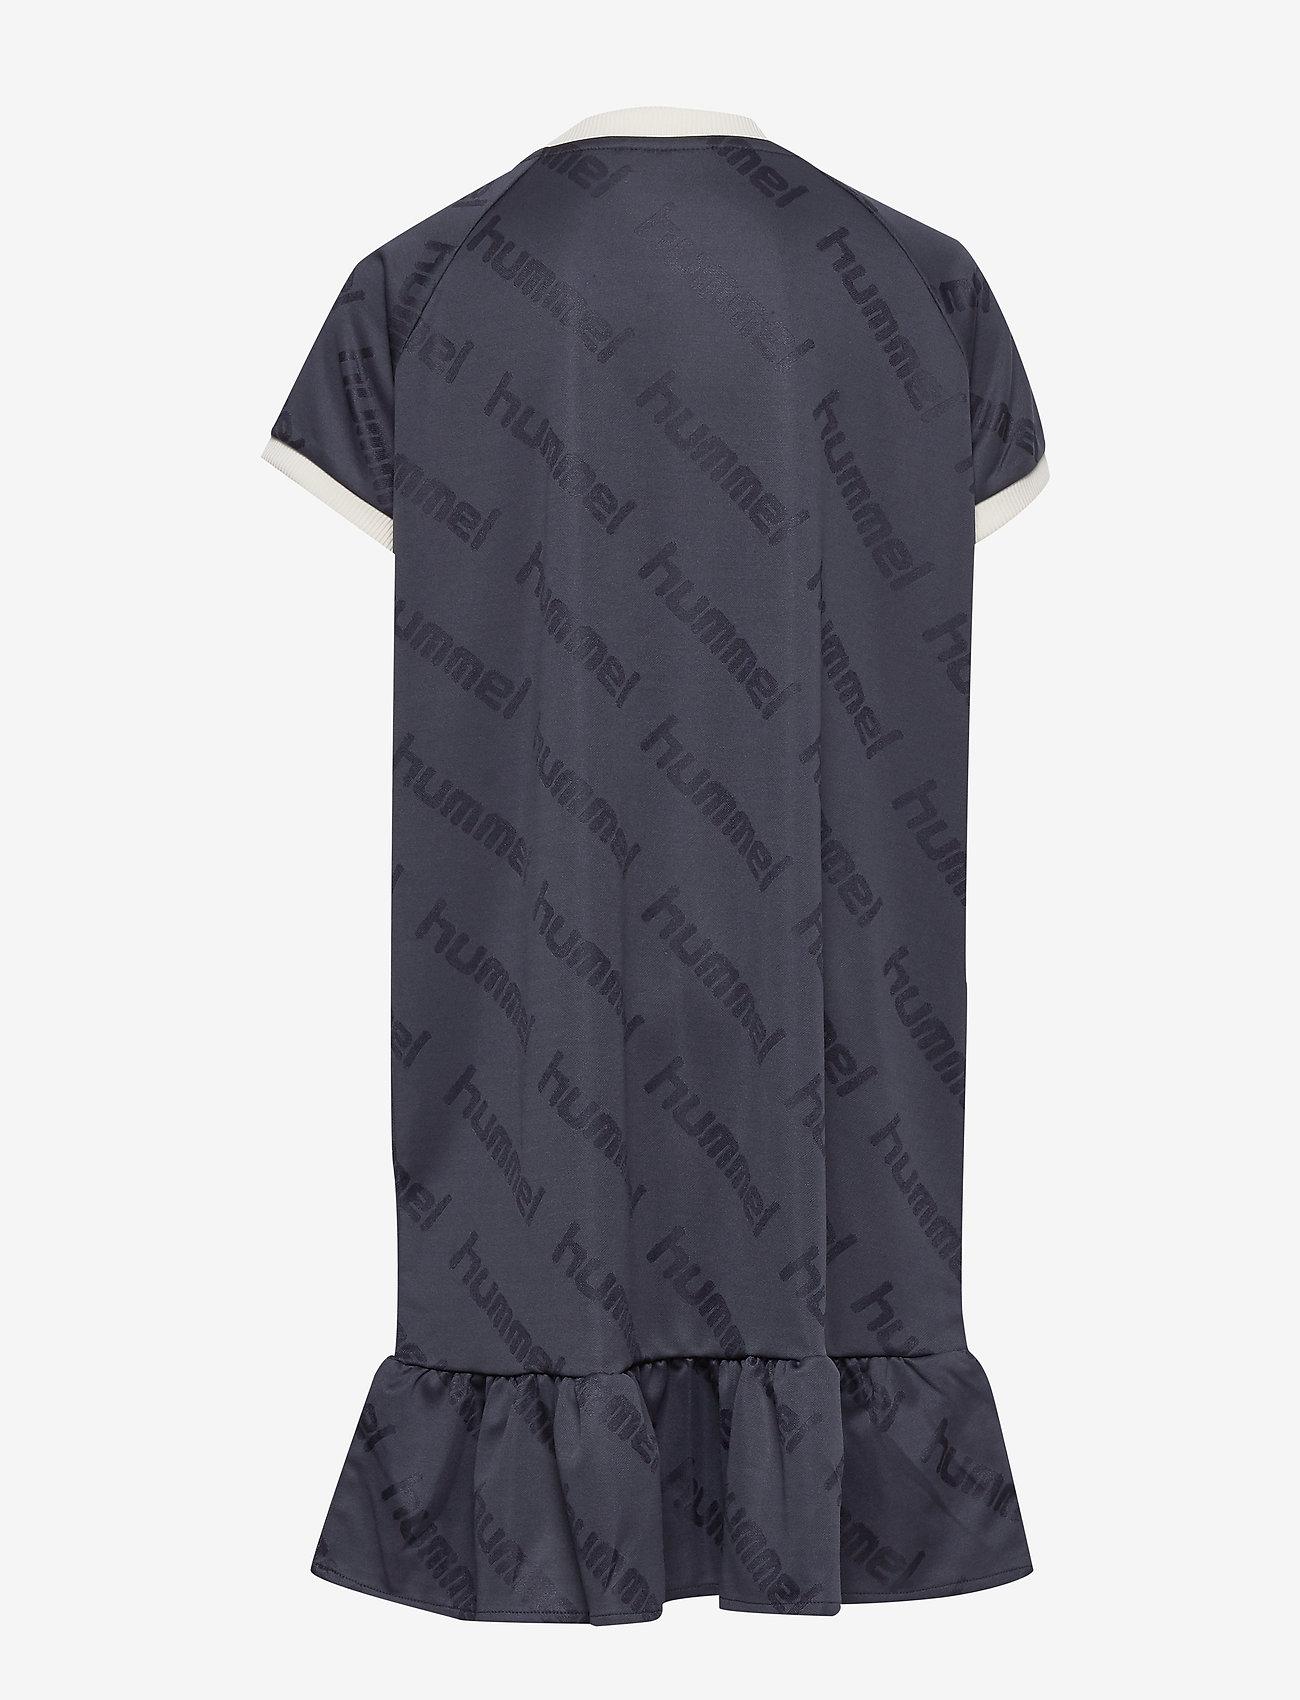 Hummel - hmlSARA DRESS S/S - kleider - blue nights - 1